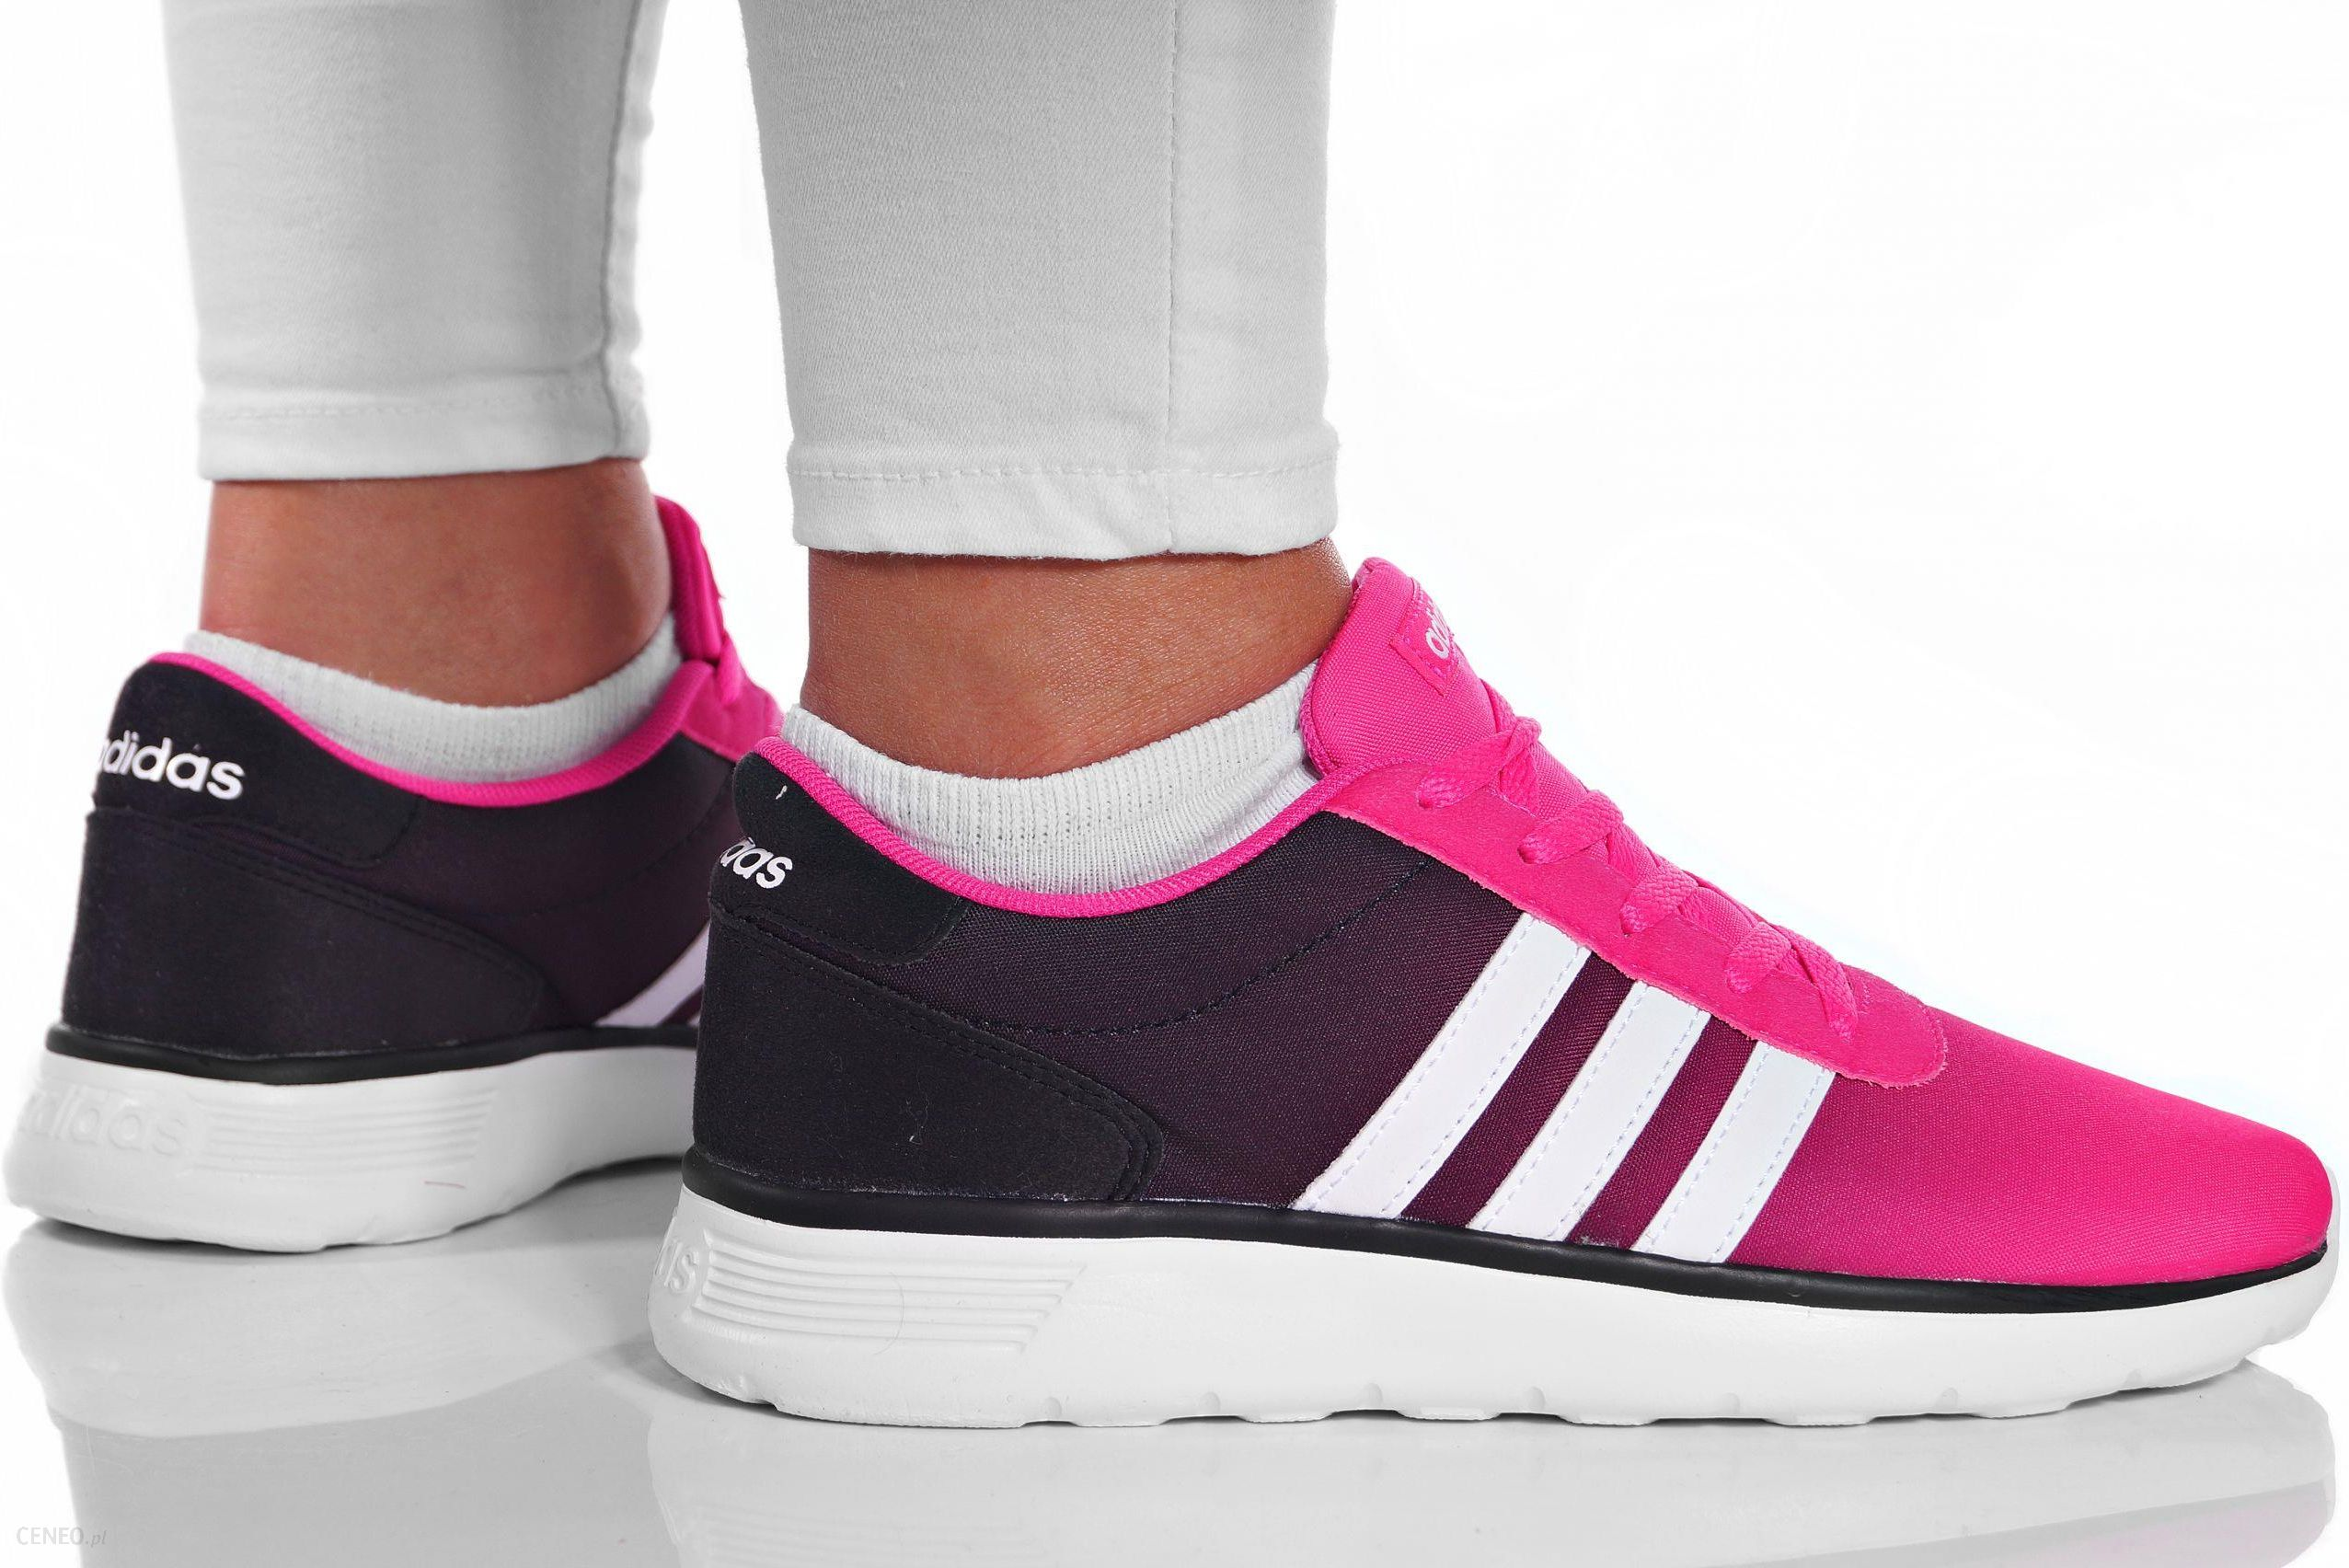 adidas neo damskie czarno różowe